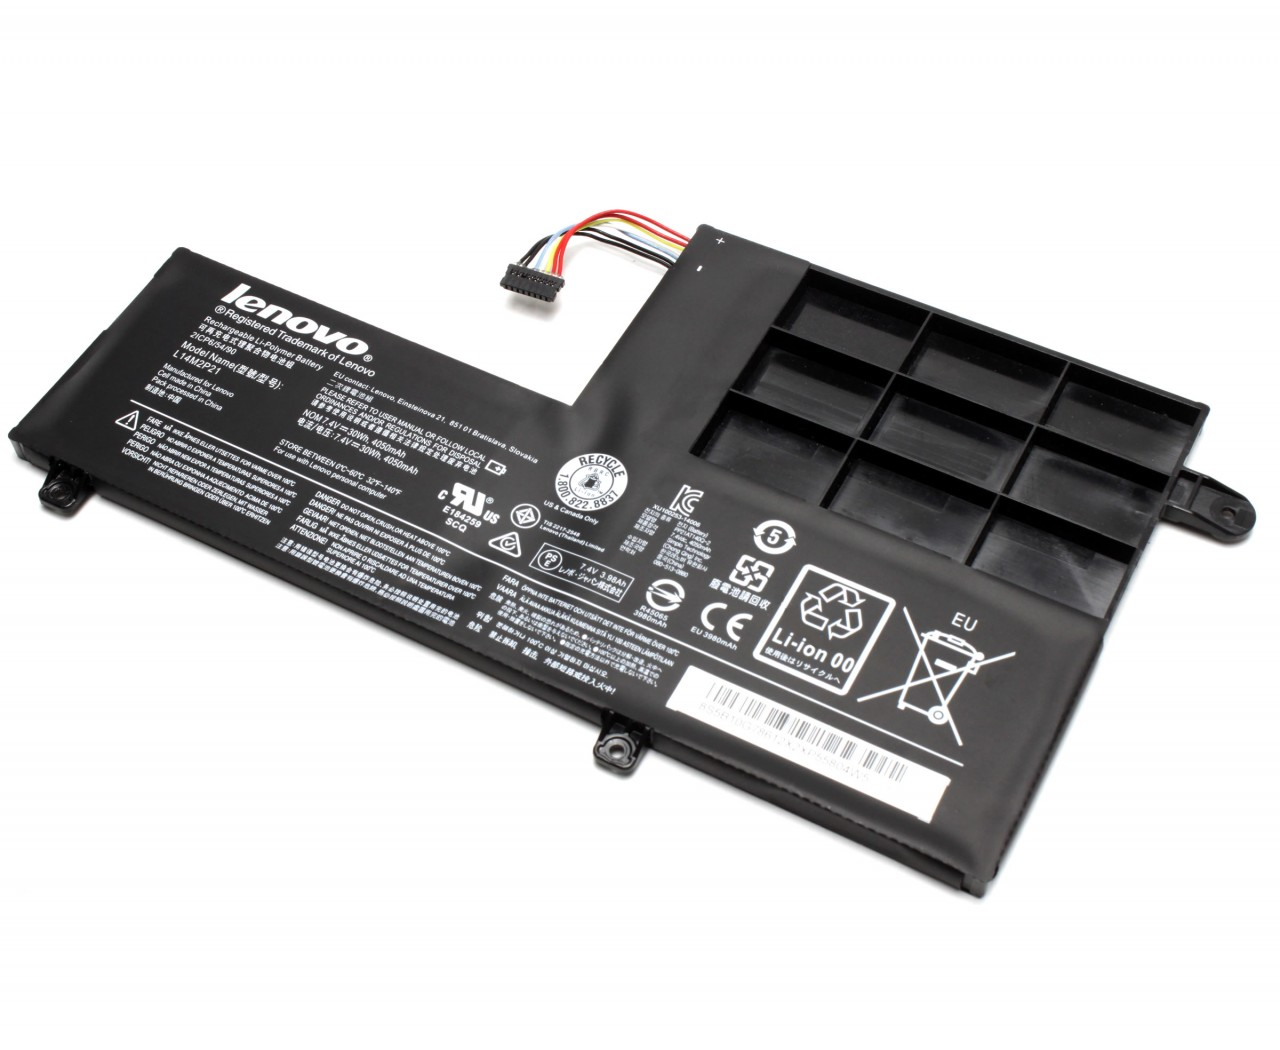 Baterie Lenovo Yoga 500-14ACL Originala 30Wh/4050mAh 2 celule imagine powerlaptop.ro 2021